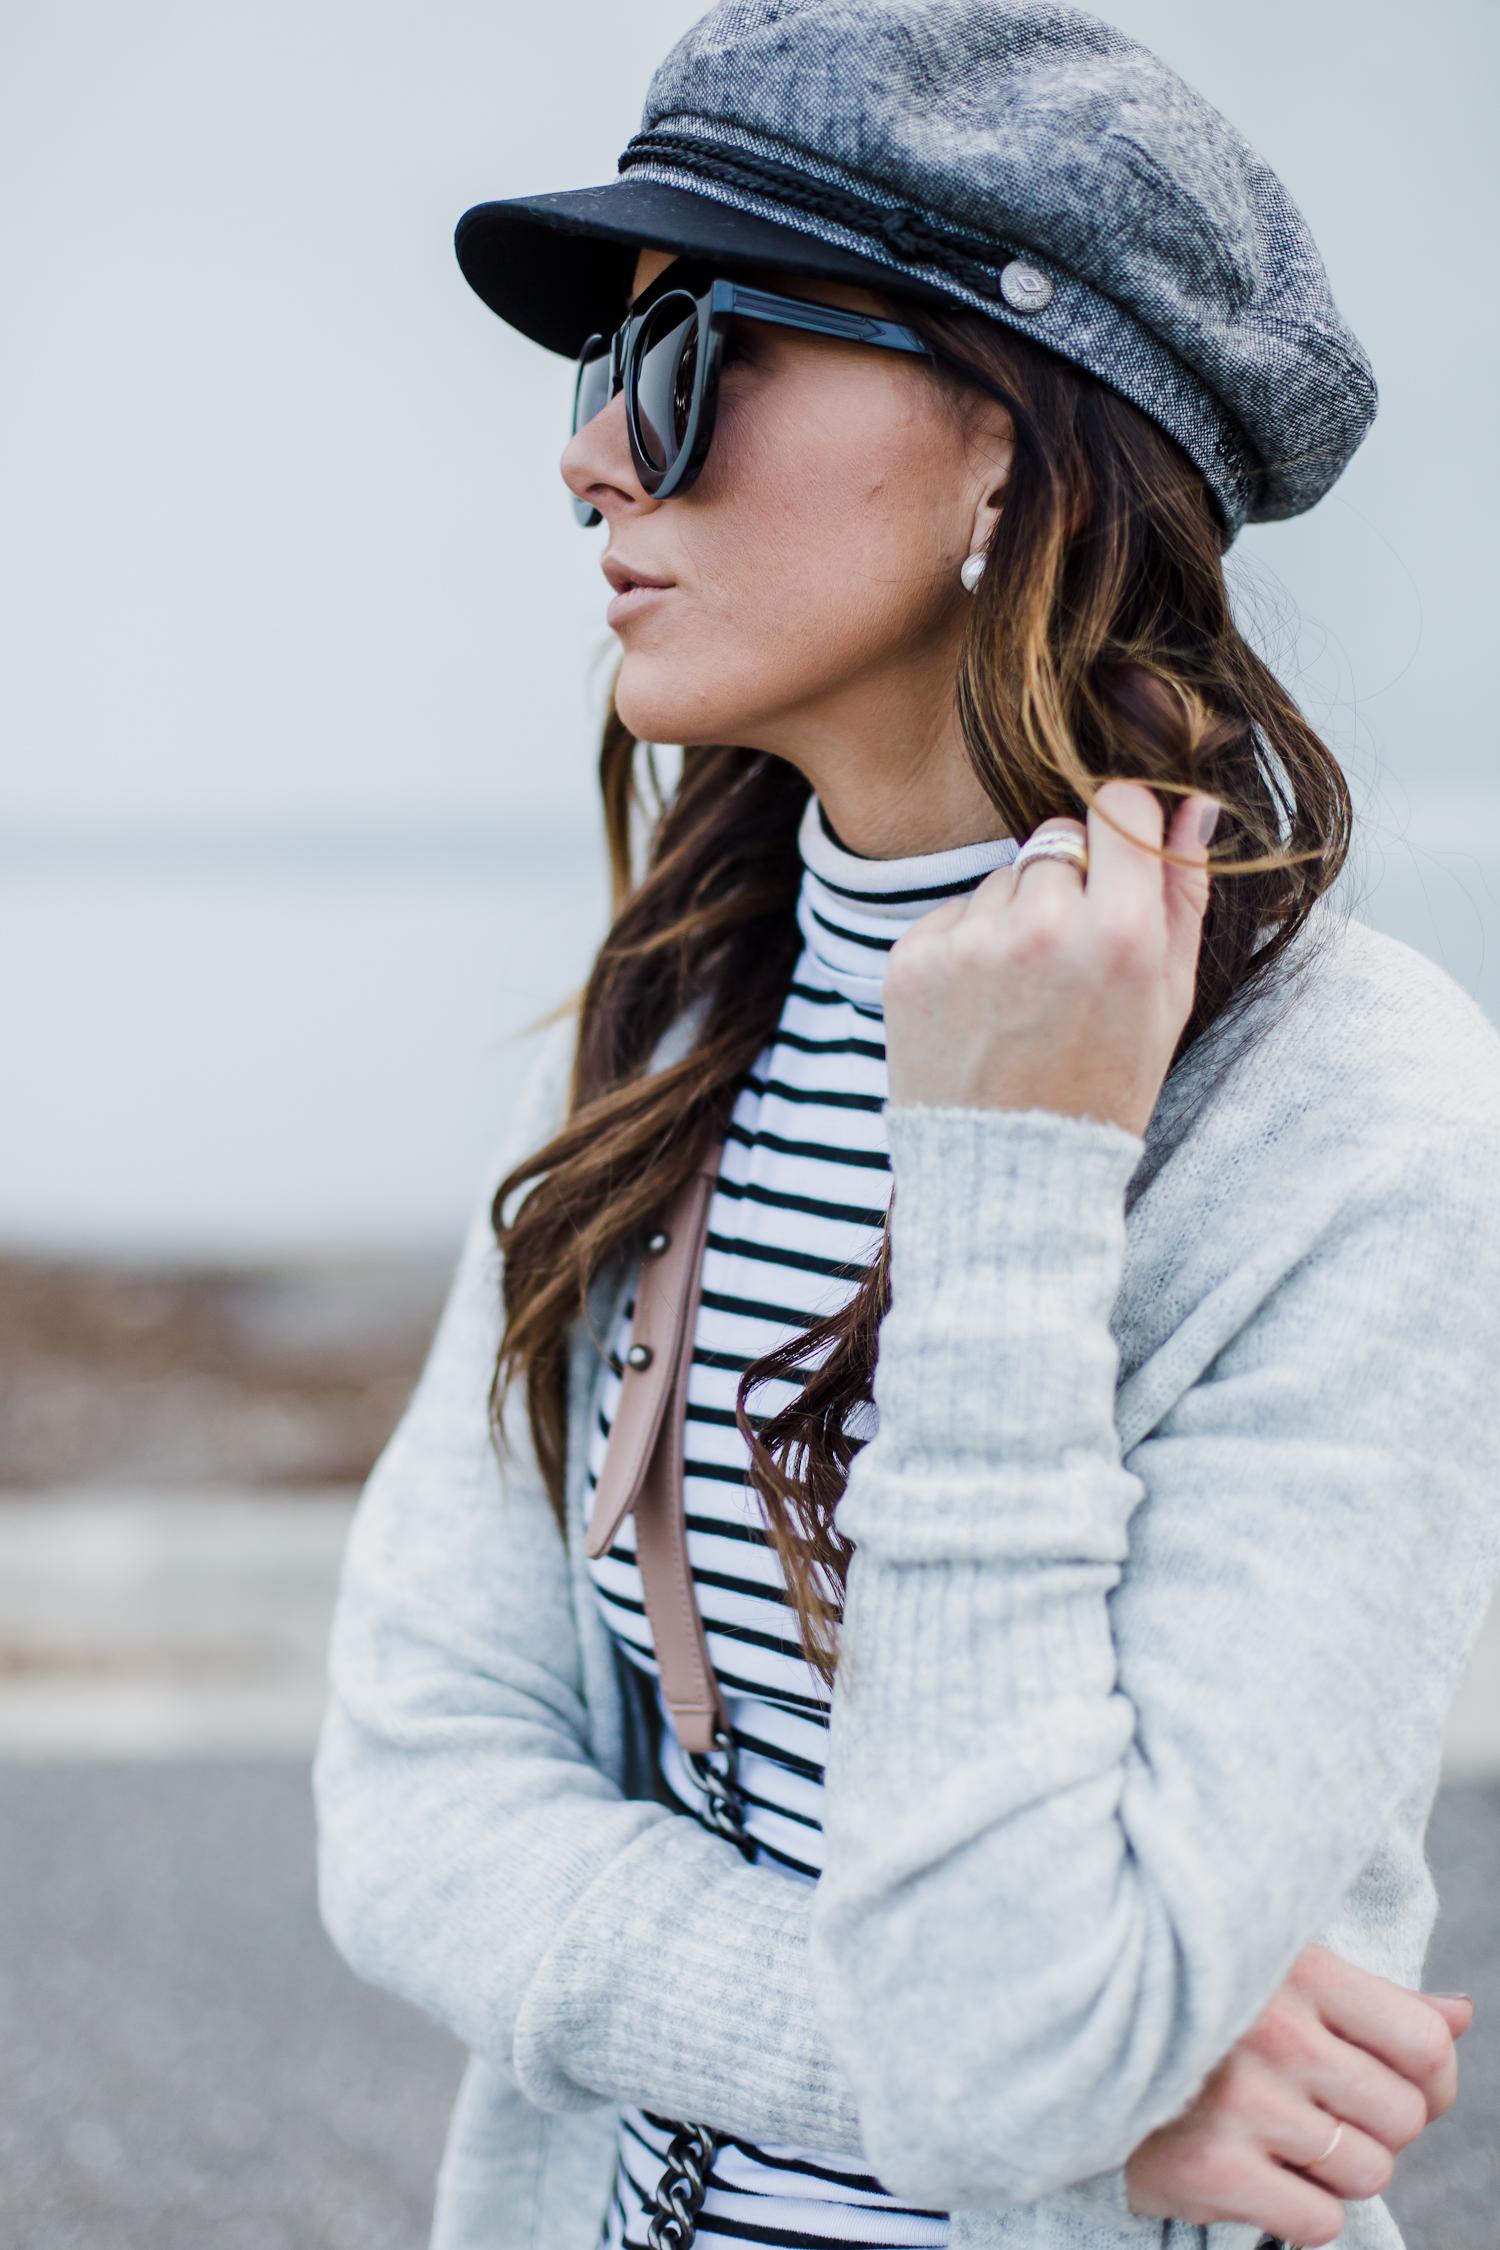 september favorites, sequins & things, alysonhaley, alyson haley